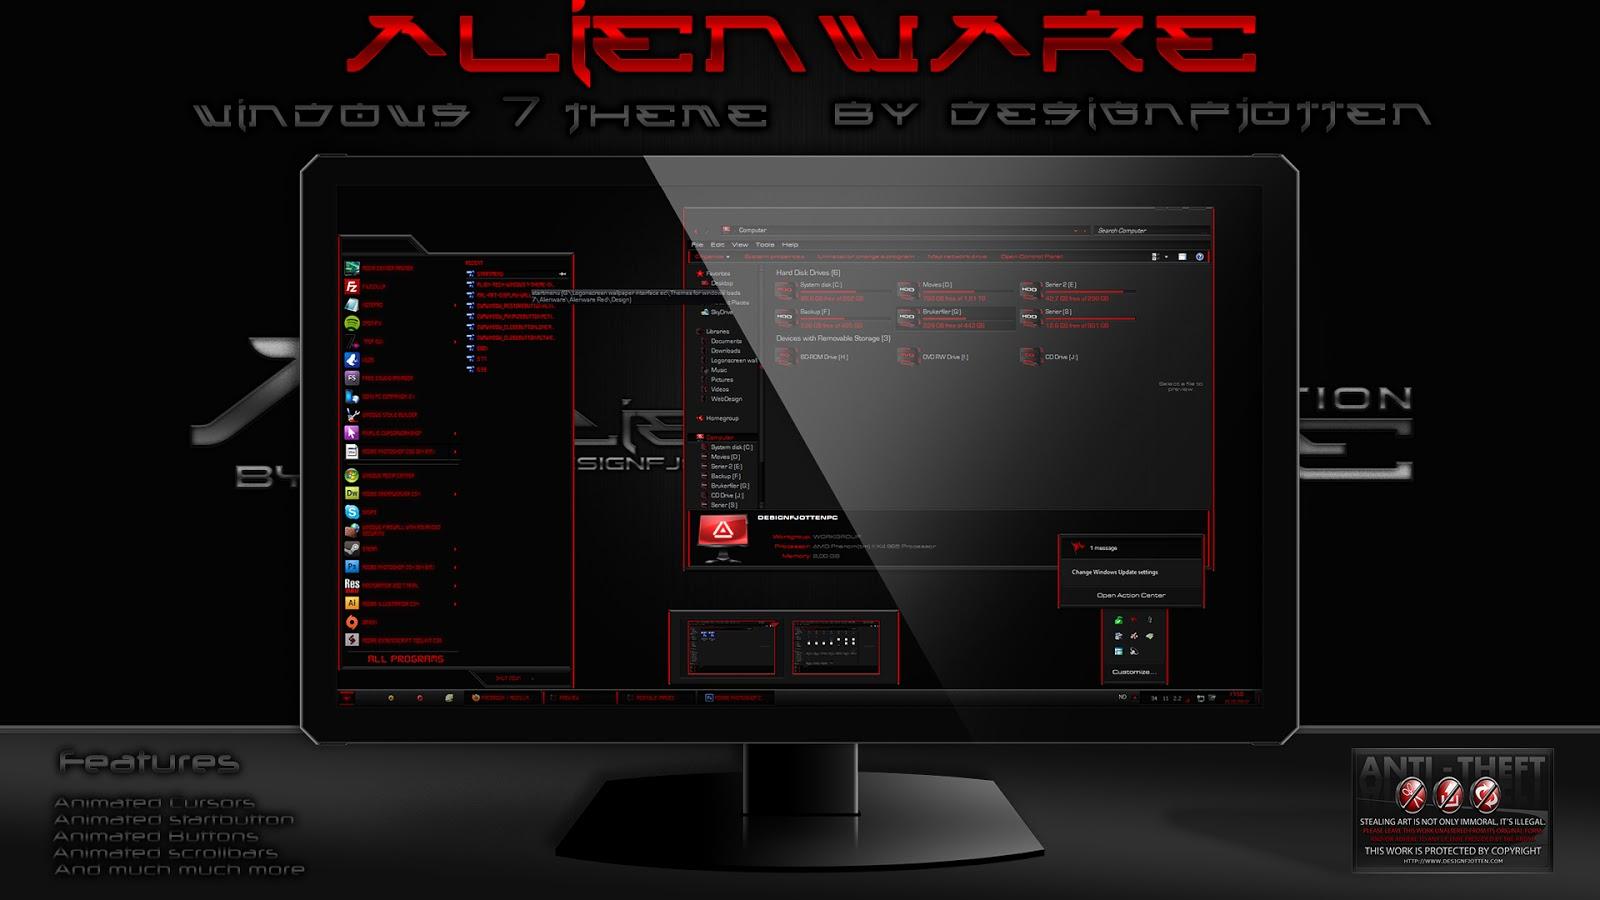 Alienware theme for windows 8.